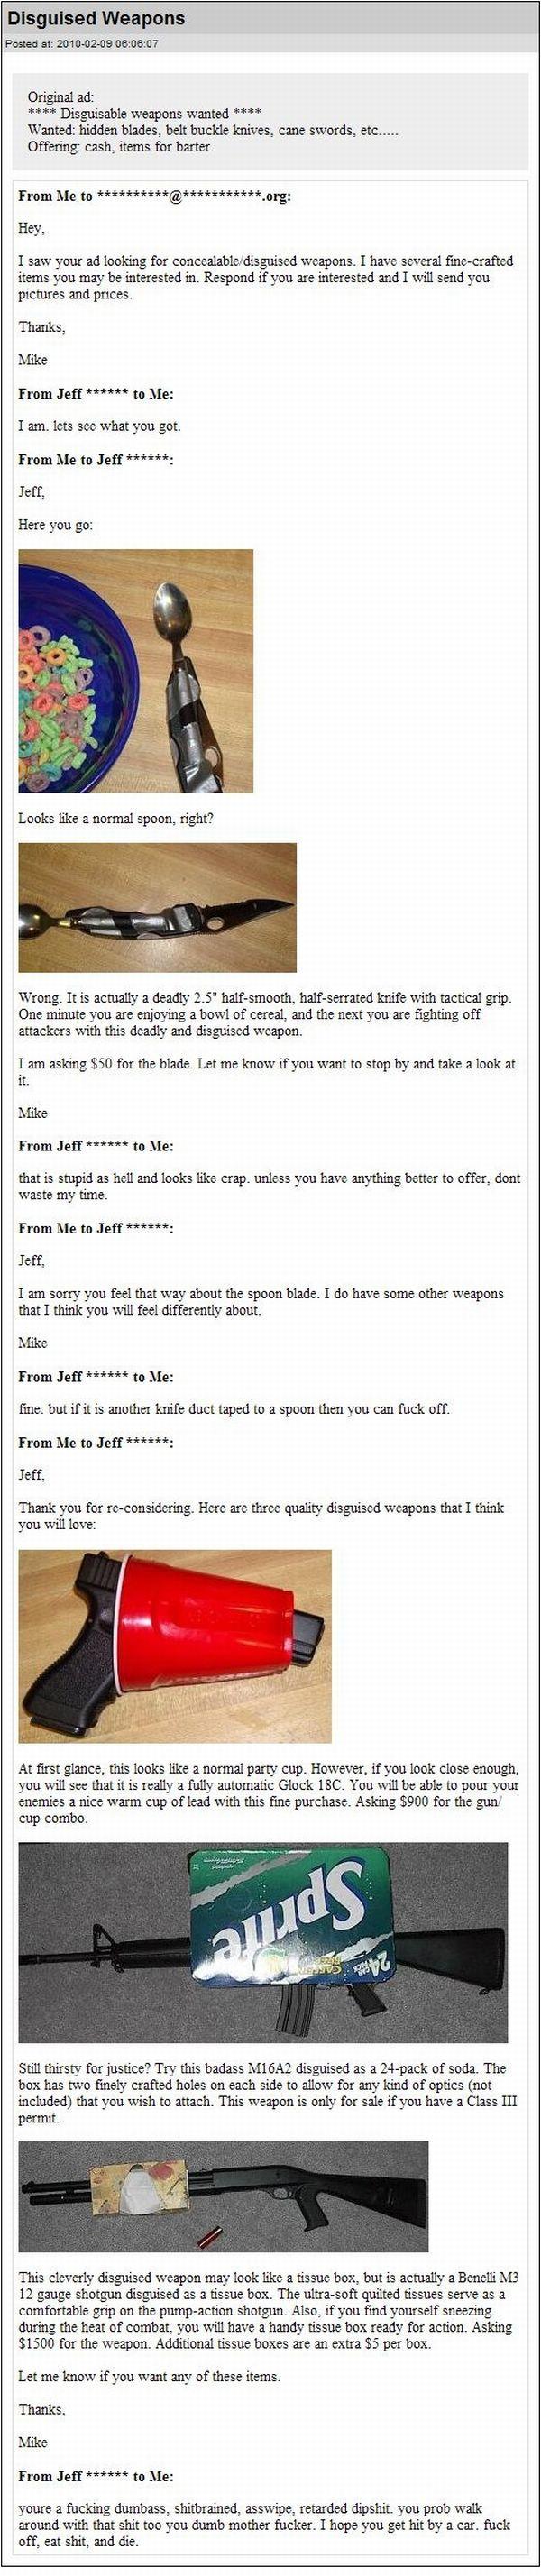 Funny Gun Disguises